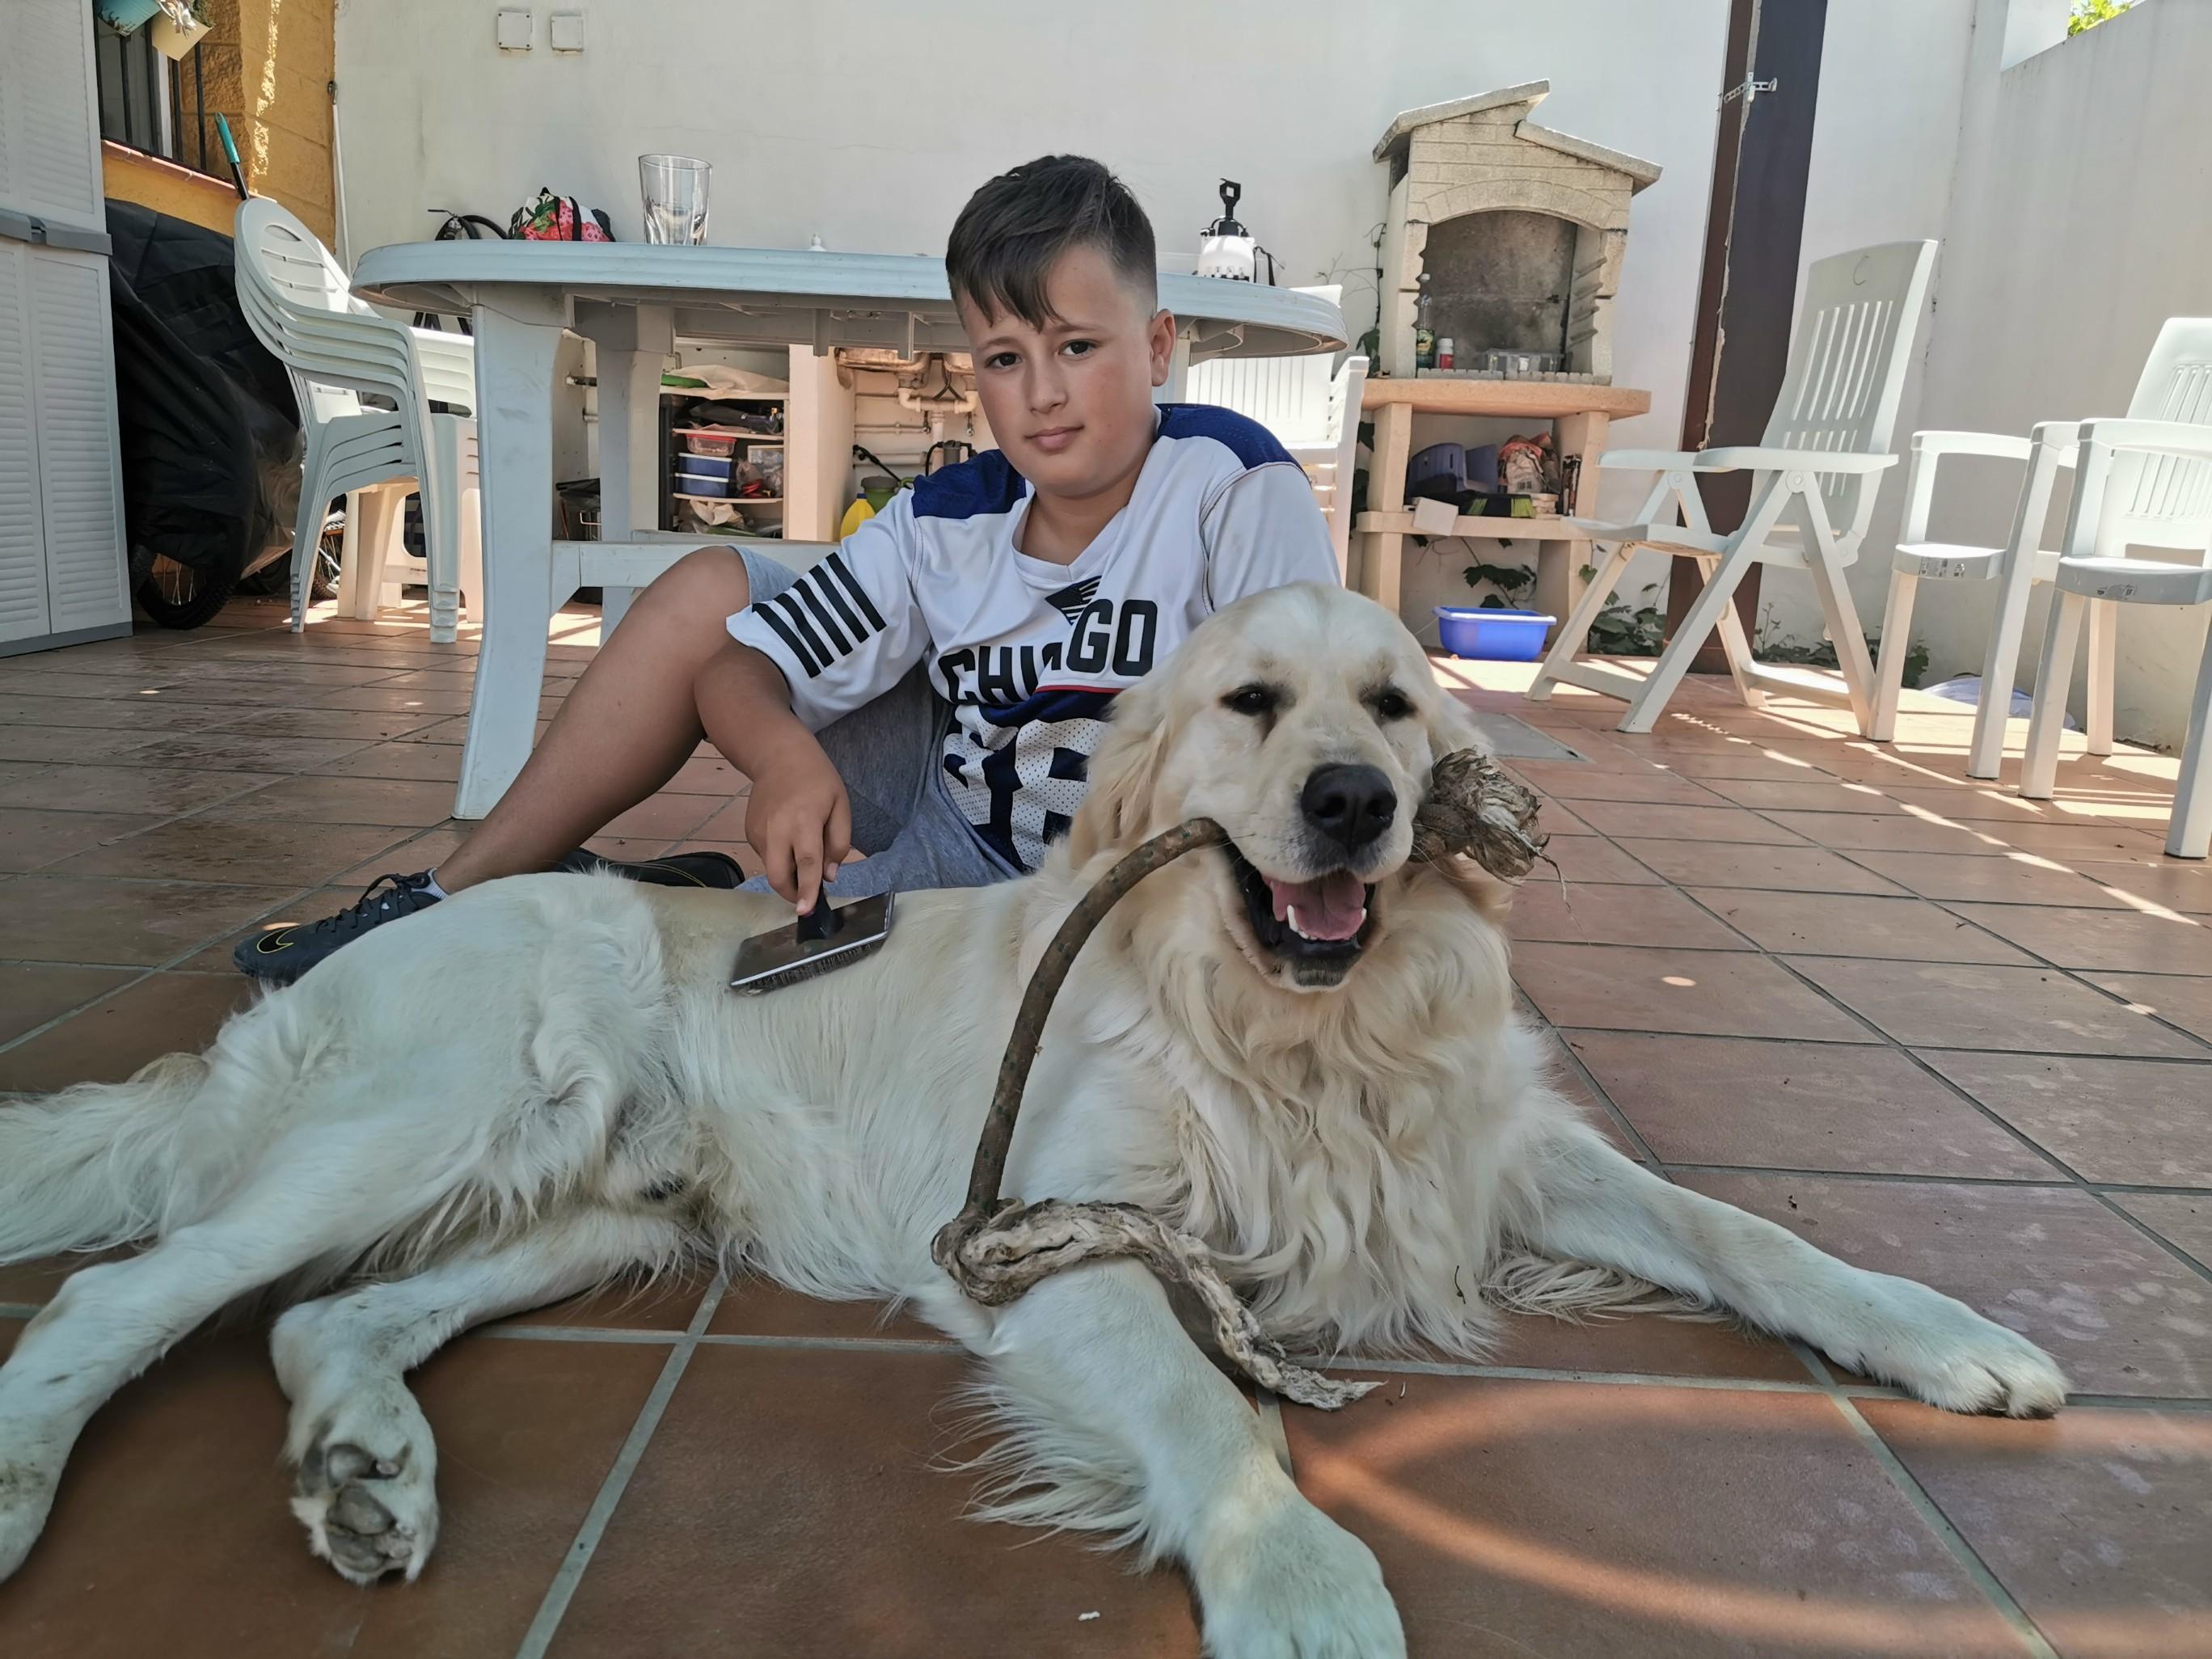 Adiestramiento canino Camacho Mijas, Fuengirola, Benalmádena, Marbella (1)